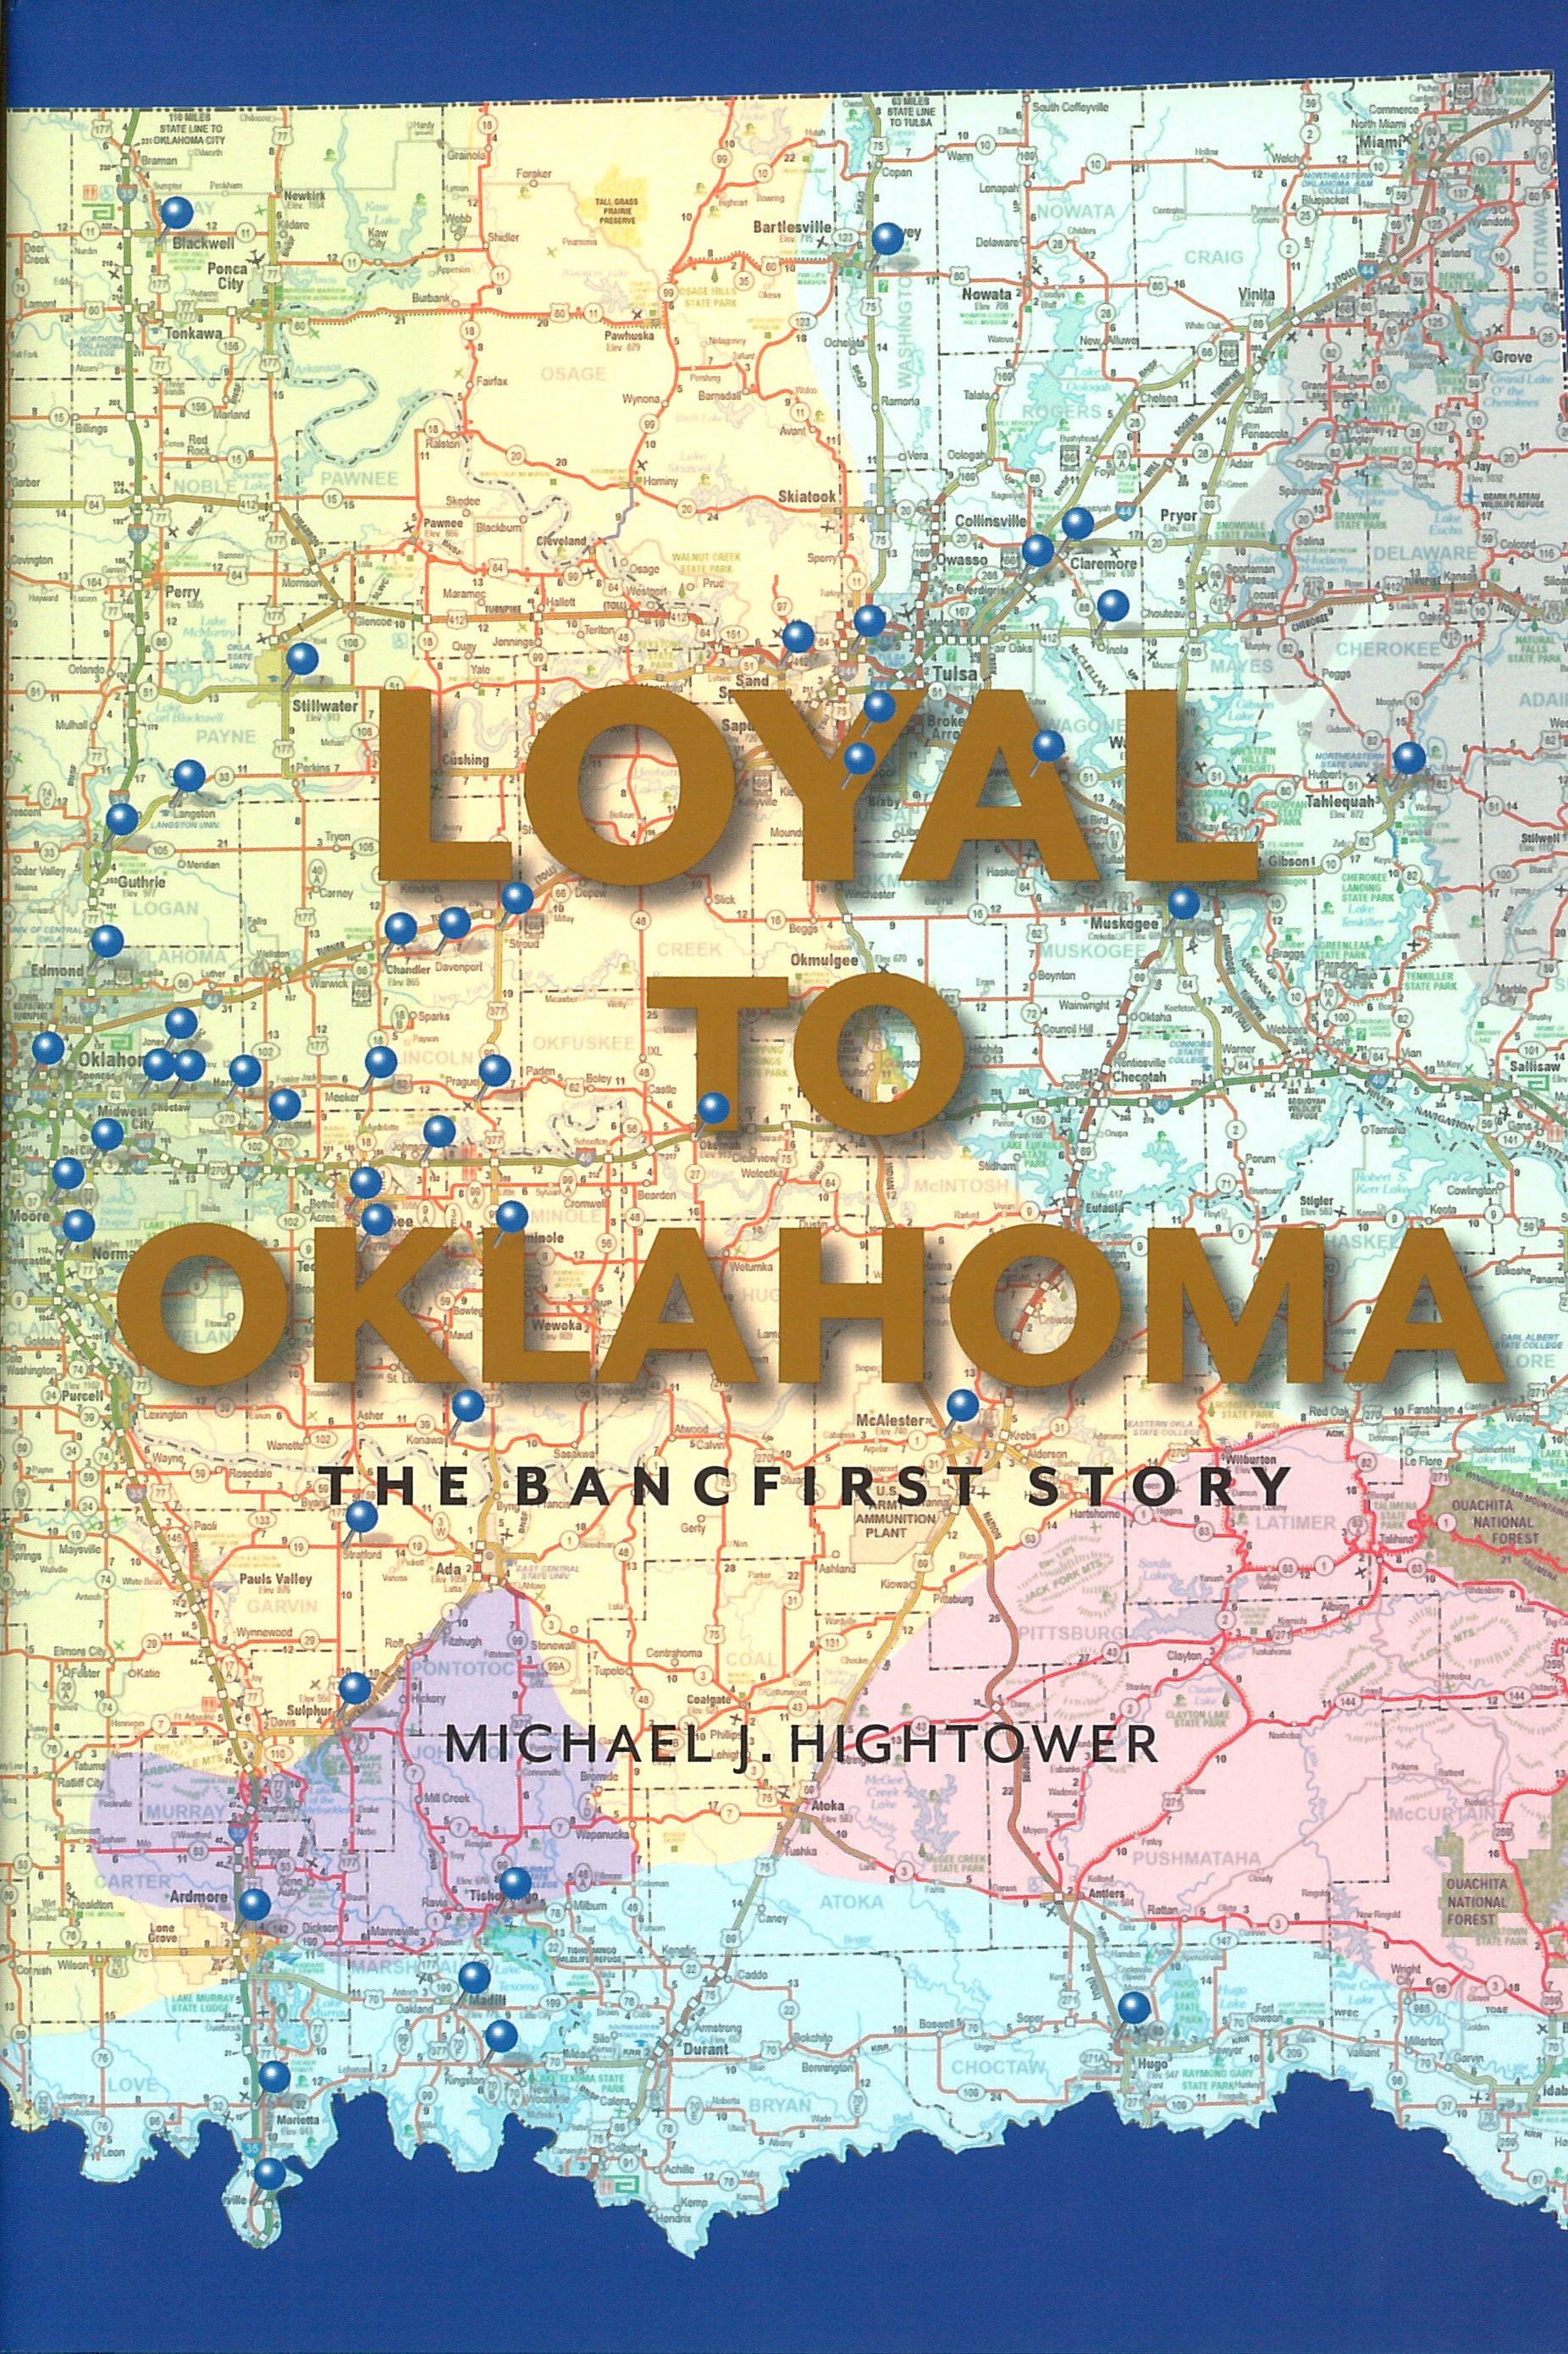 Loyal to Oklahoma 09-13-2018.jpg